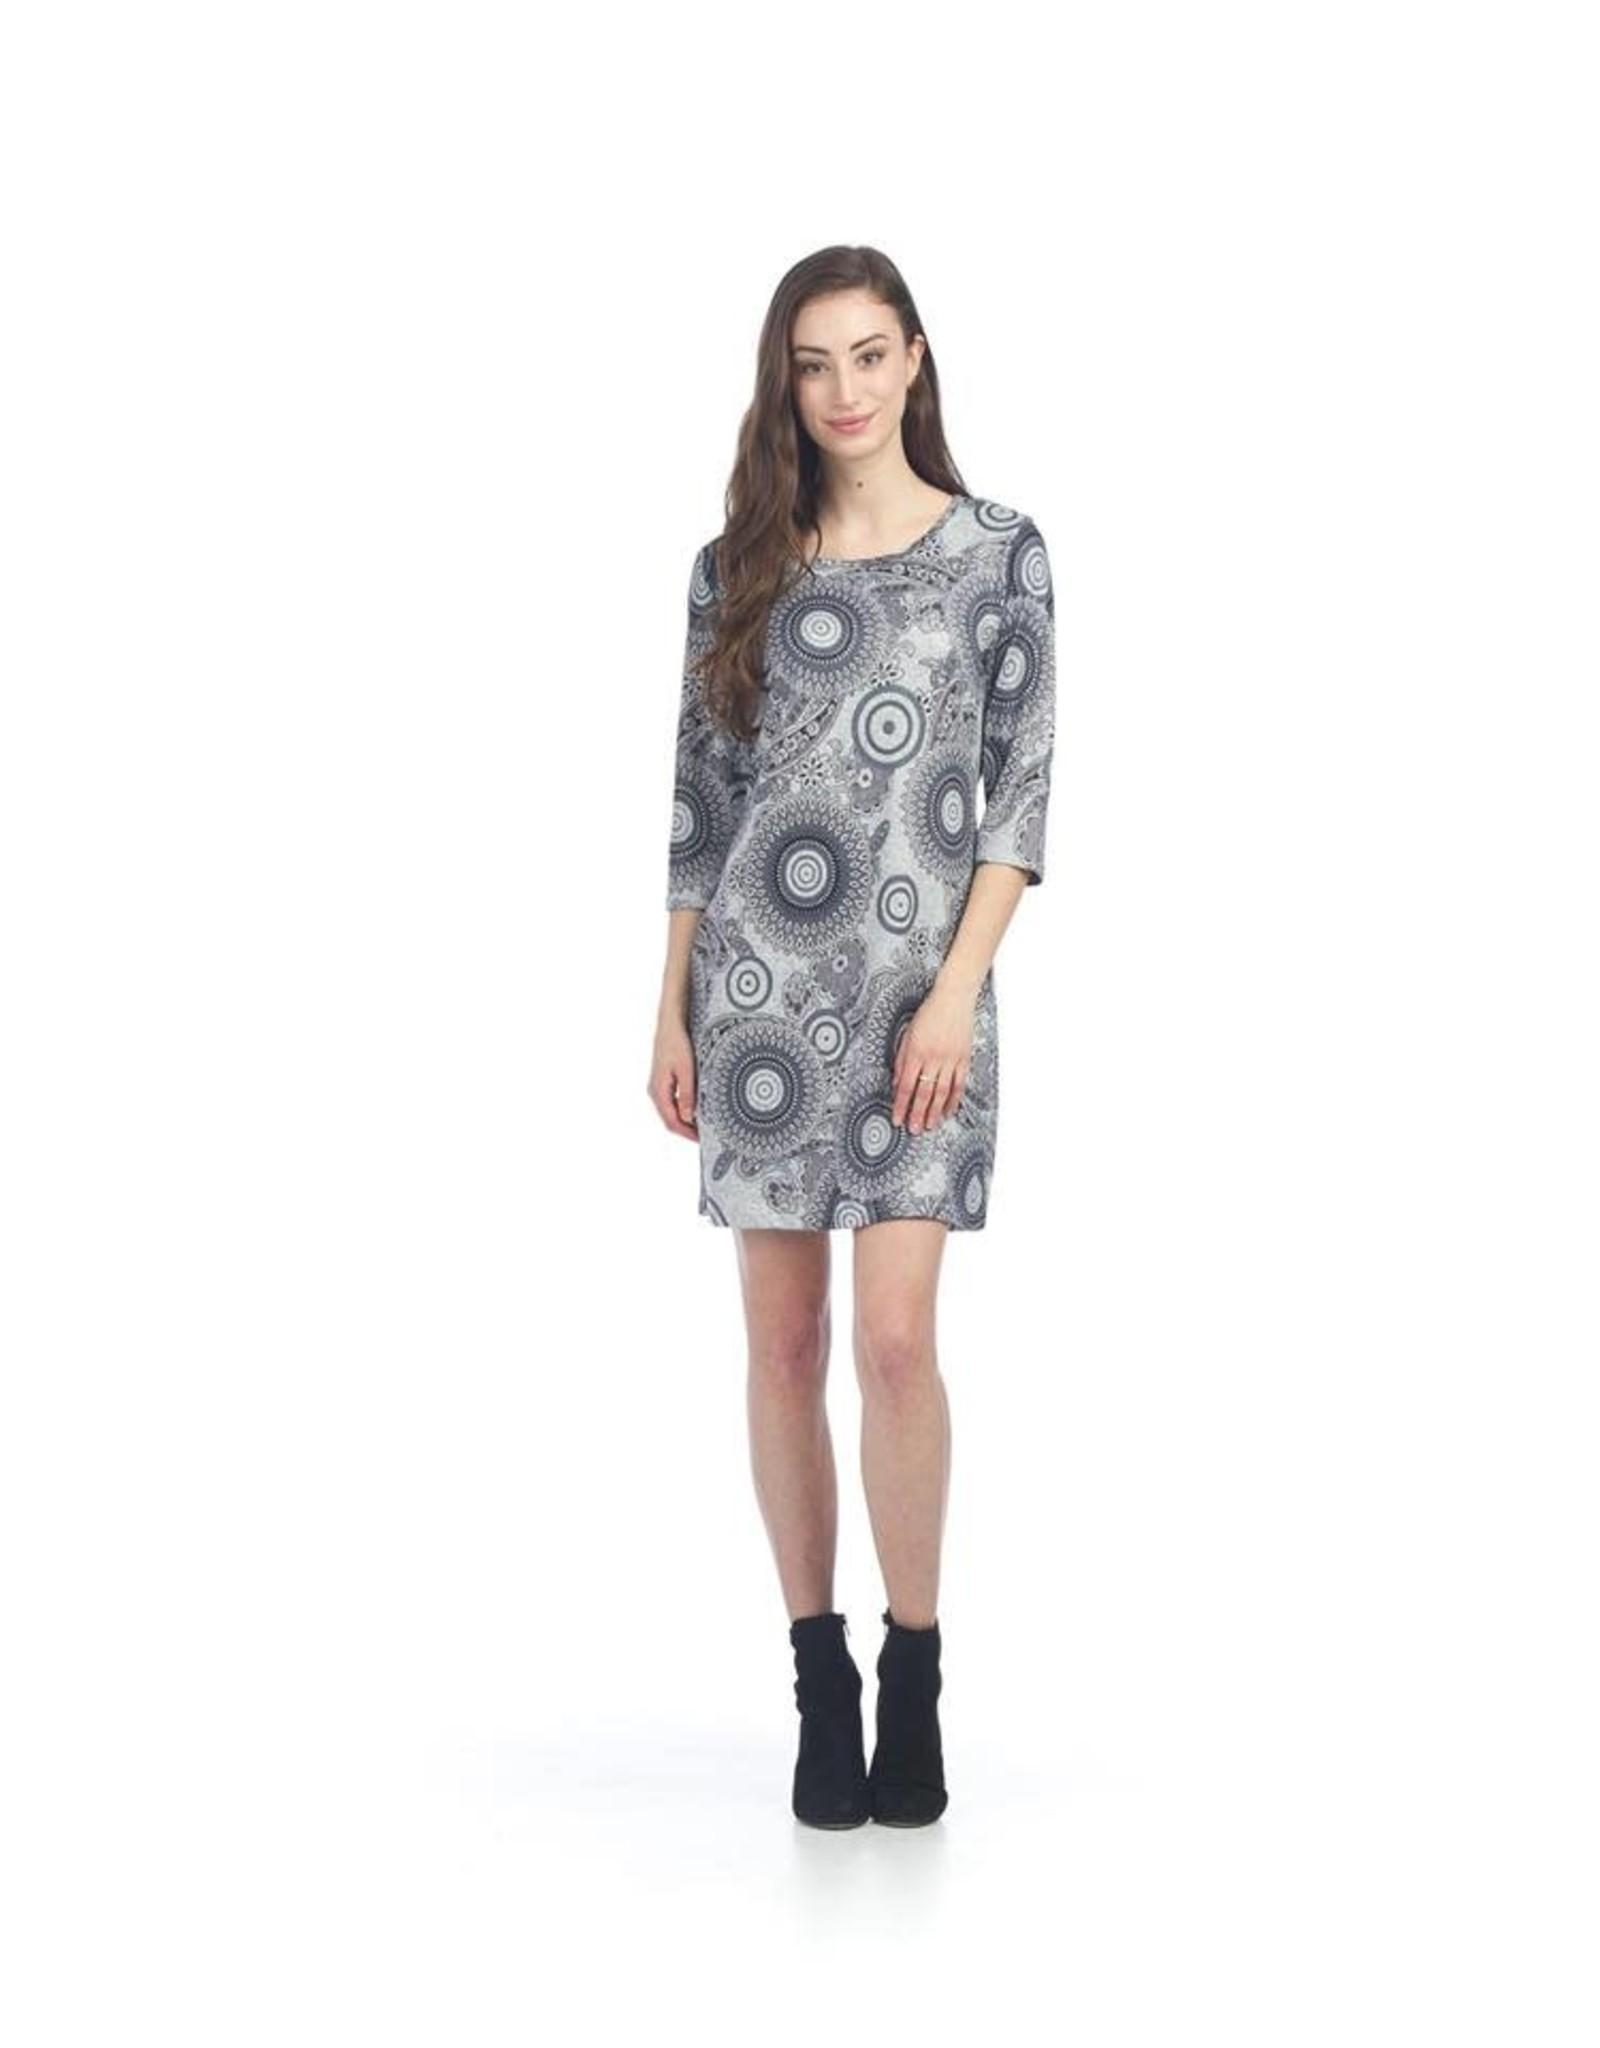 Papillon Medallion Sweater Dress